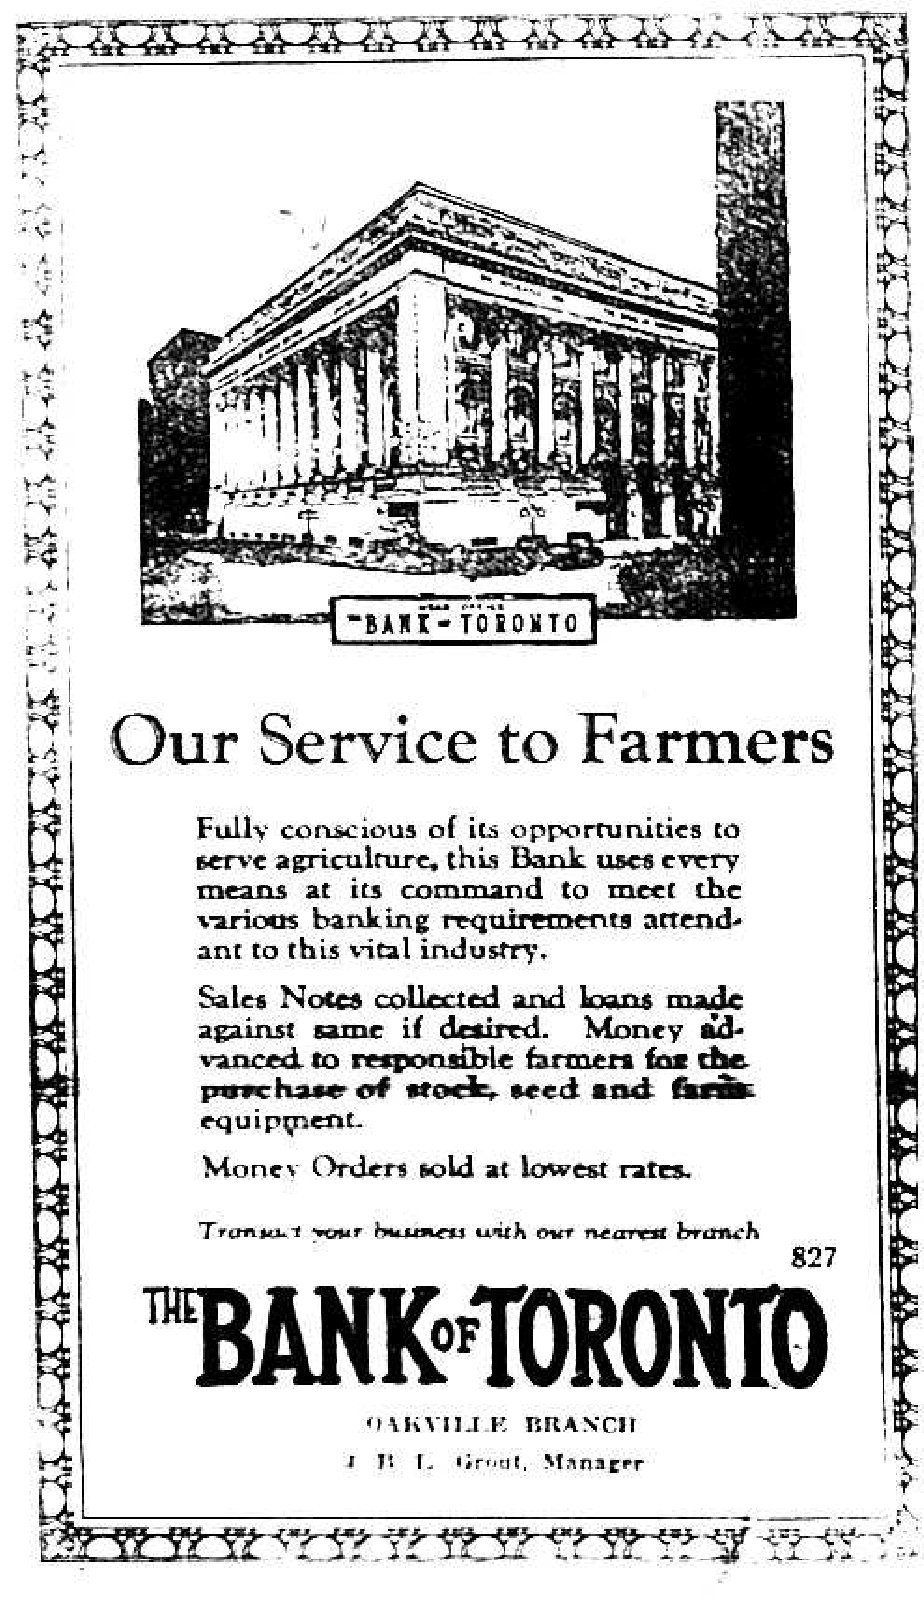 The Bank of Toronto Advertisement (1928)